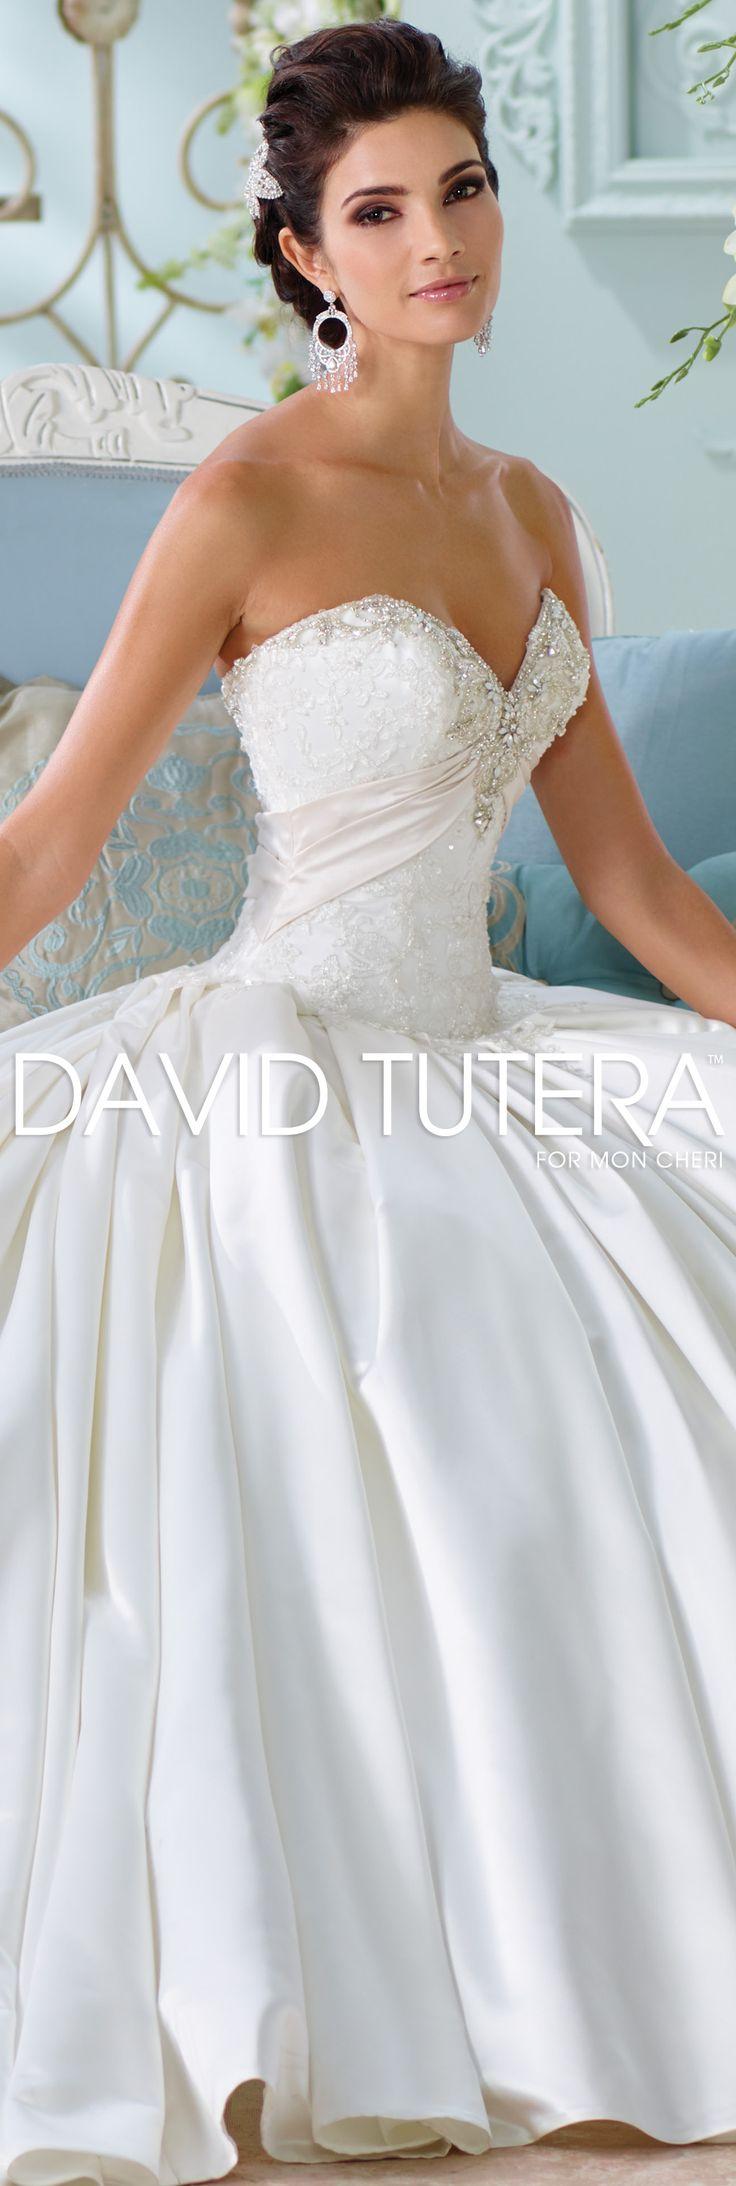 The David Tutera for Mon Cheri Spring 2016 Wedding Gown Collection - Style No. 116200 Heloise #satinweddingdresses